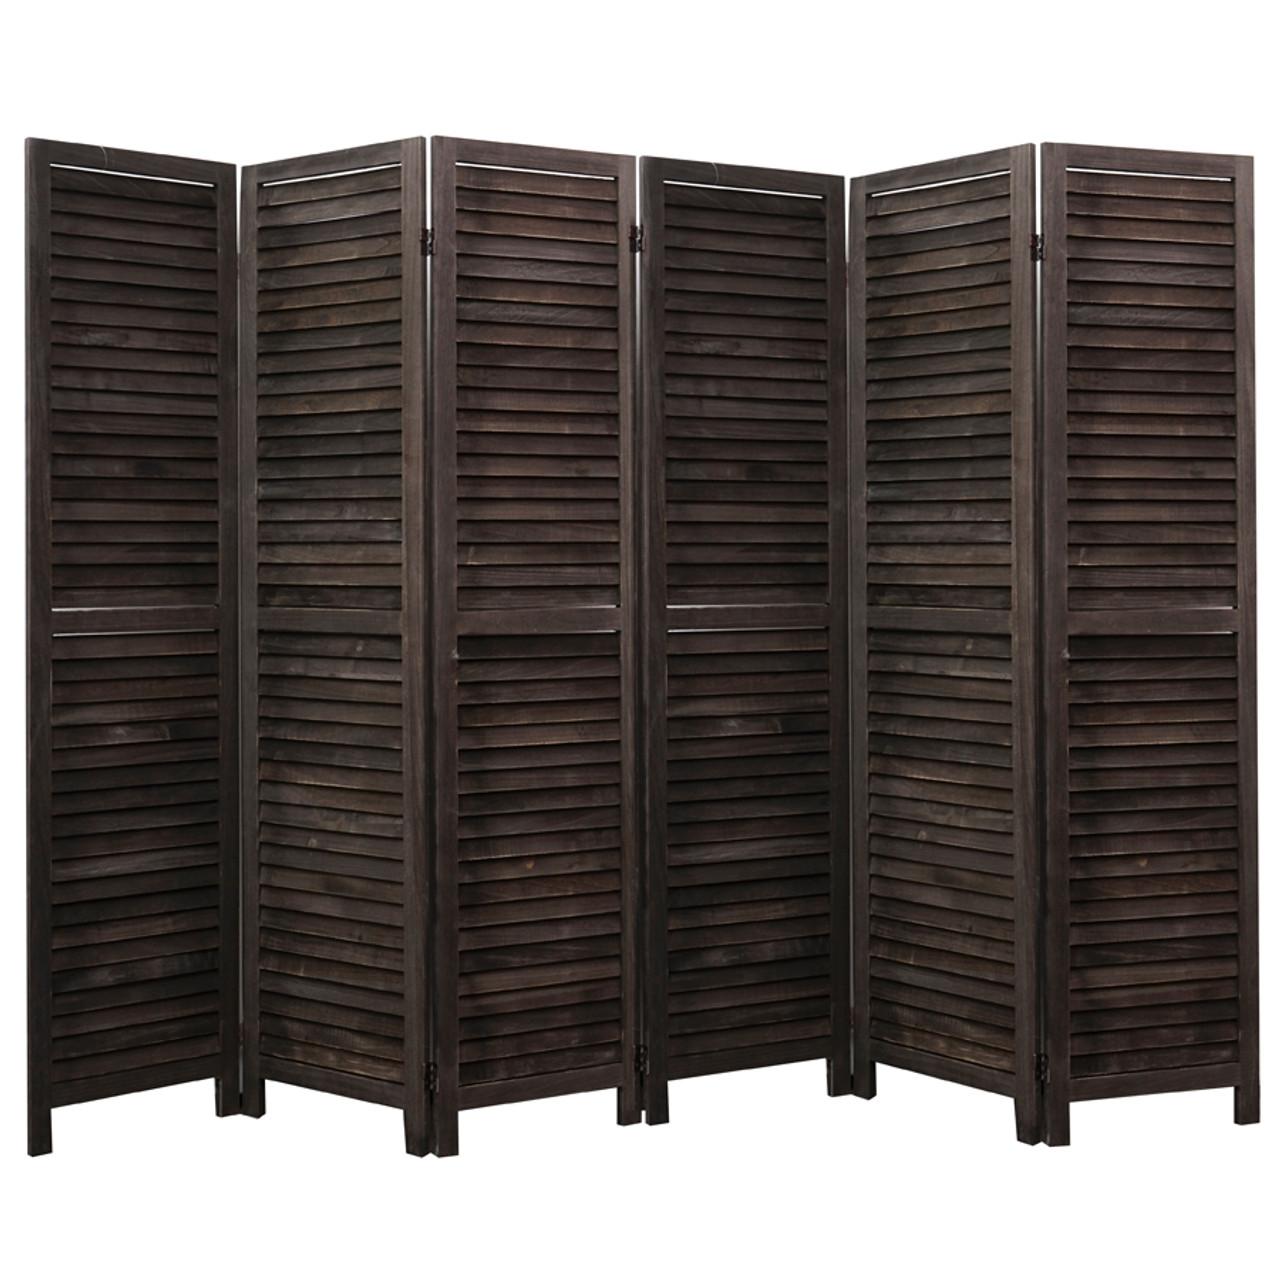 4, 6, 8 Panel Room Divider Full Length Wood Shutters Black in USA, California, New York, New York City, Los Angeles, San Francisco, Pennsylvania, Washington DC, Virginia and Maryland